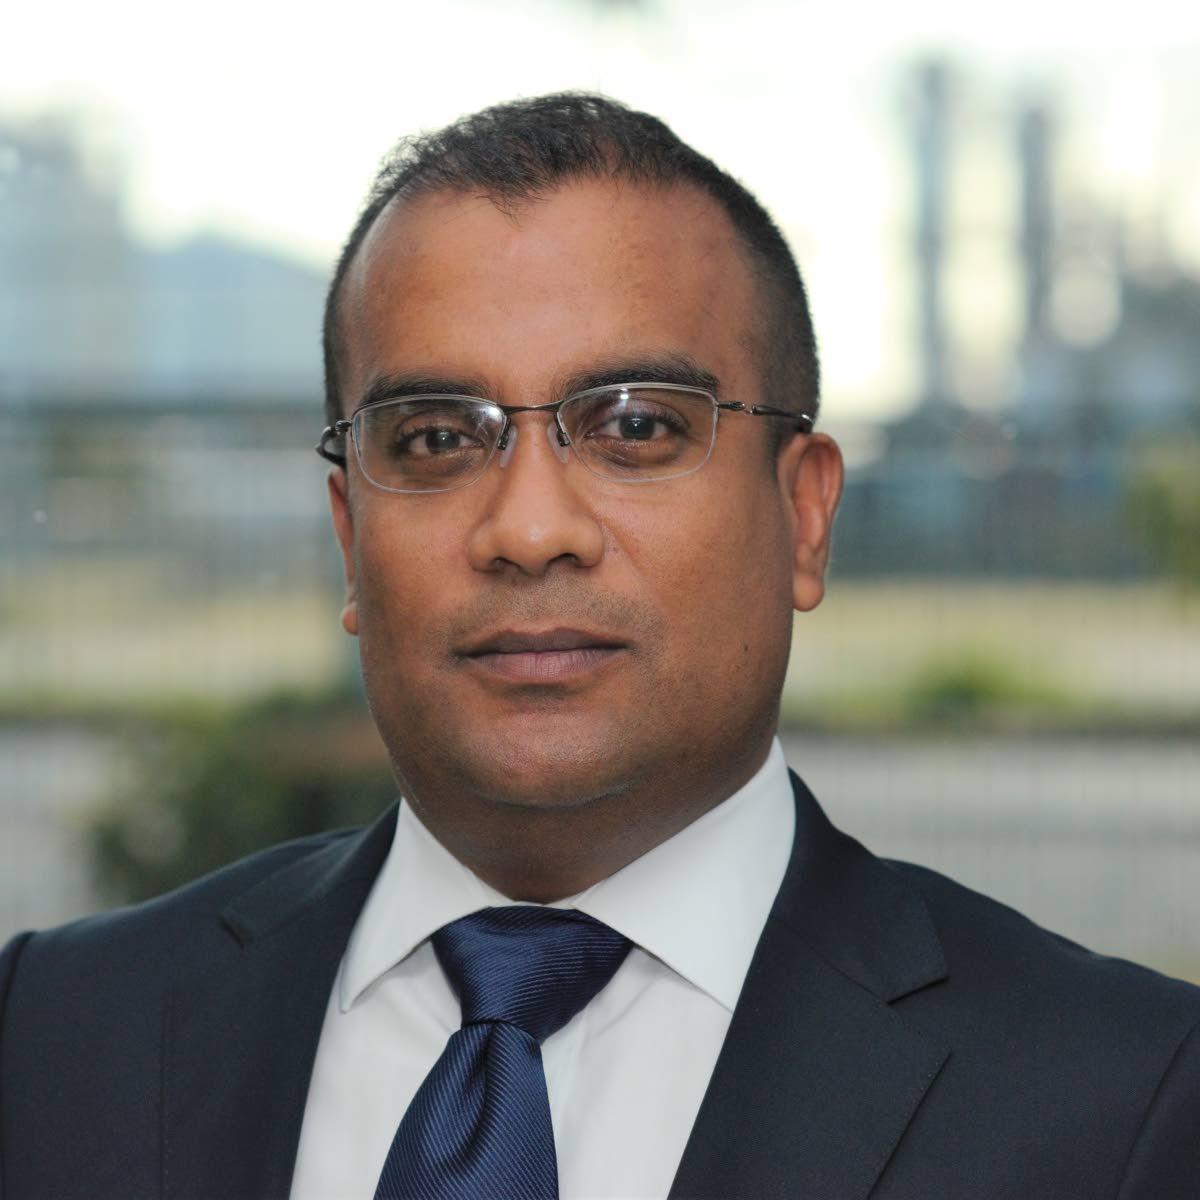 Joel Pemberton, founder and CEO of DeNovo Energy Ltd (DeNovo). PHOTO COURTESY DENOVO